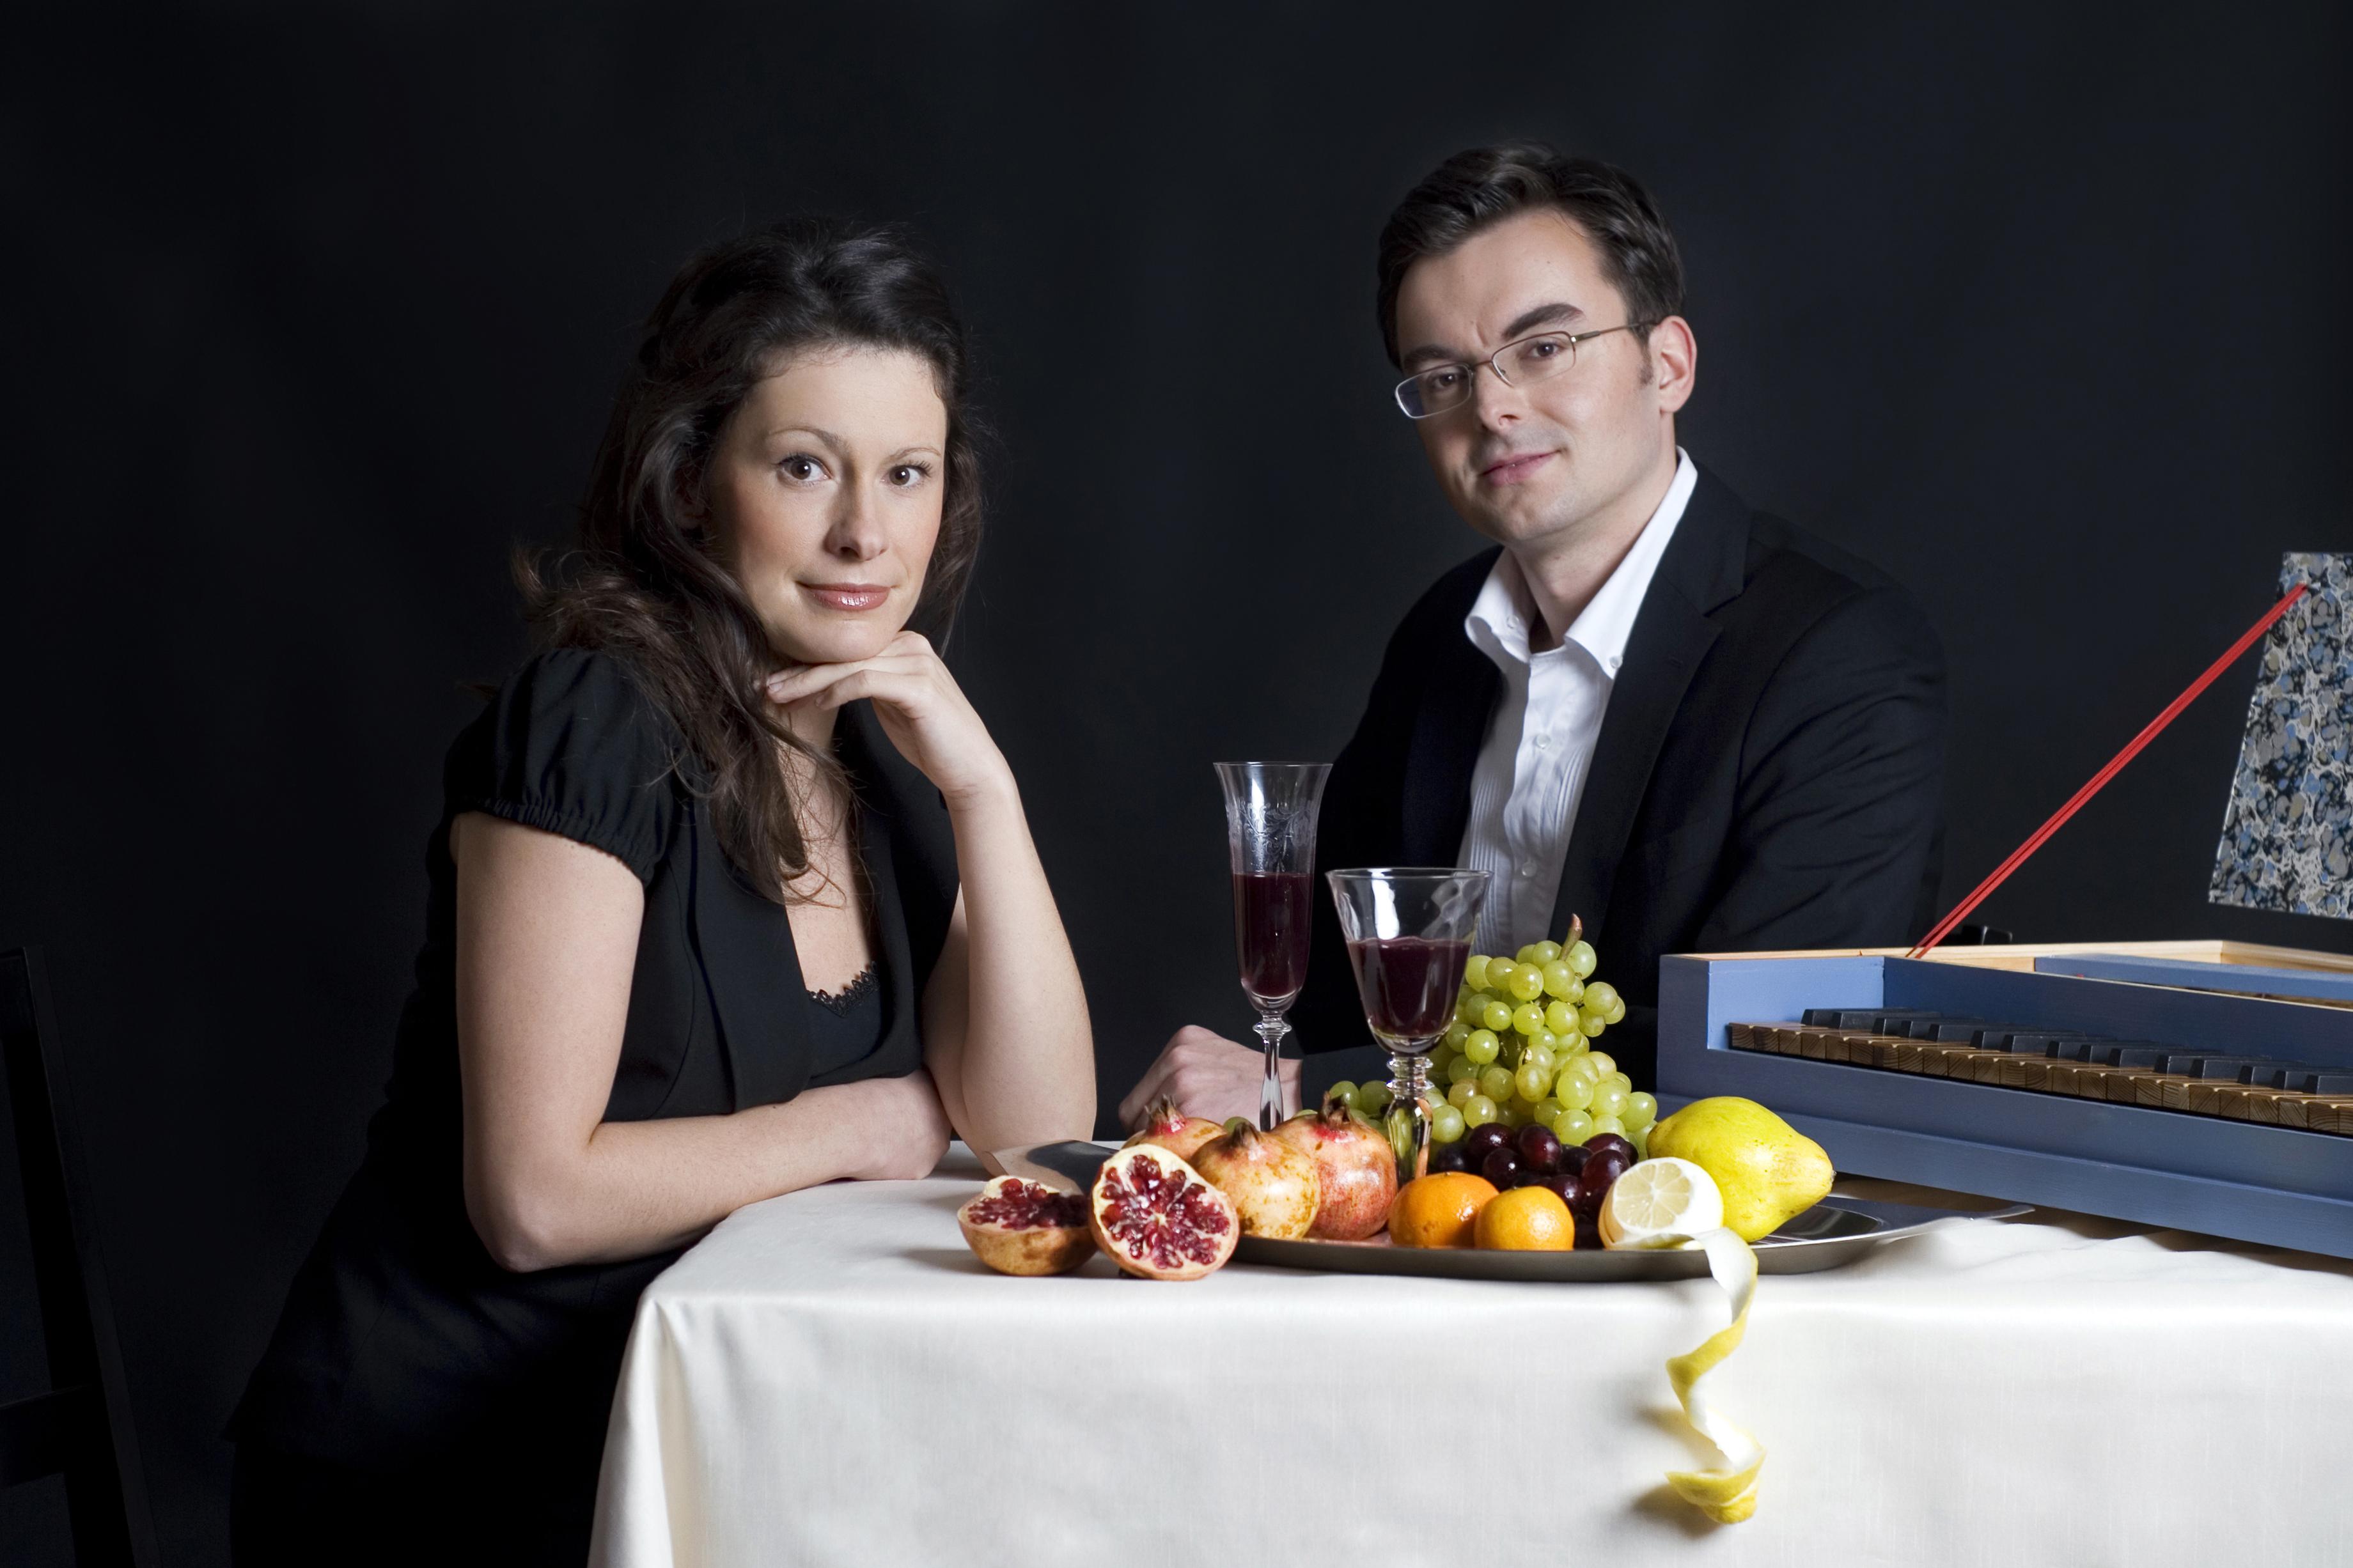 Aleksandra und Alexander Grychtolik (c)Sandra Neumann